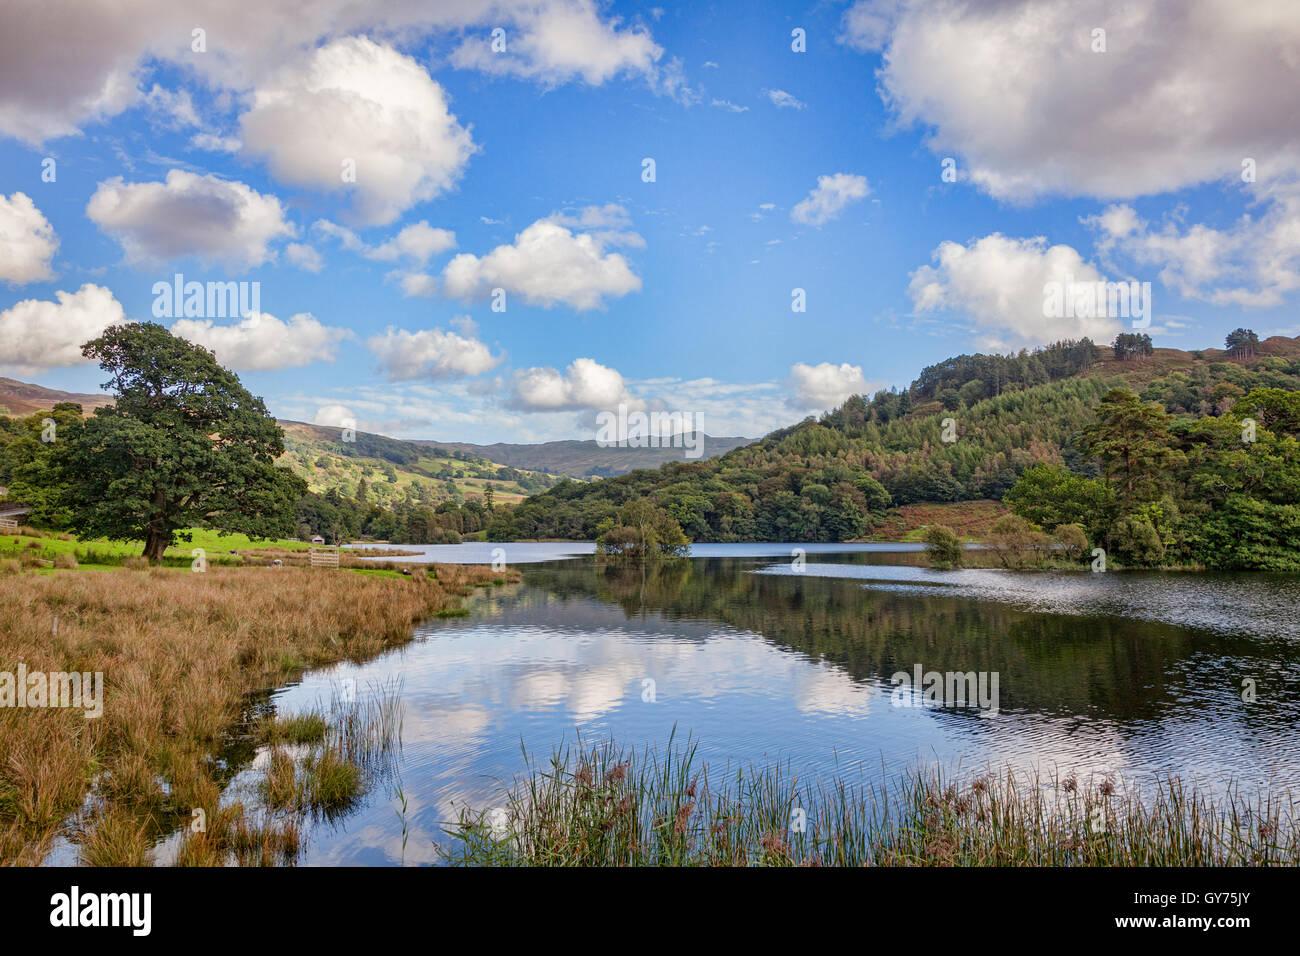 Rydal Water, Lake District National Park, Cumbria, England, UK - Stock Image